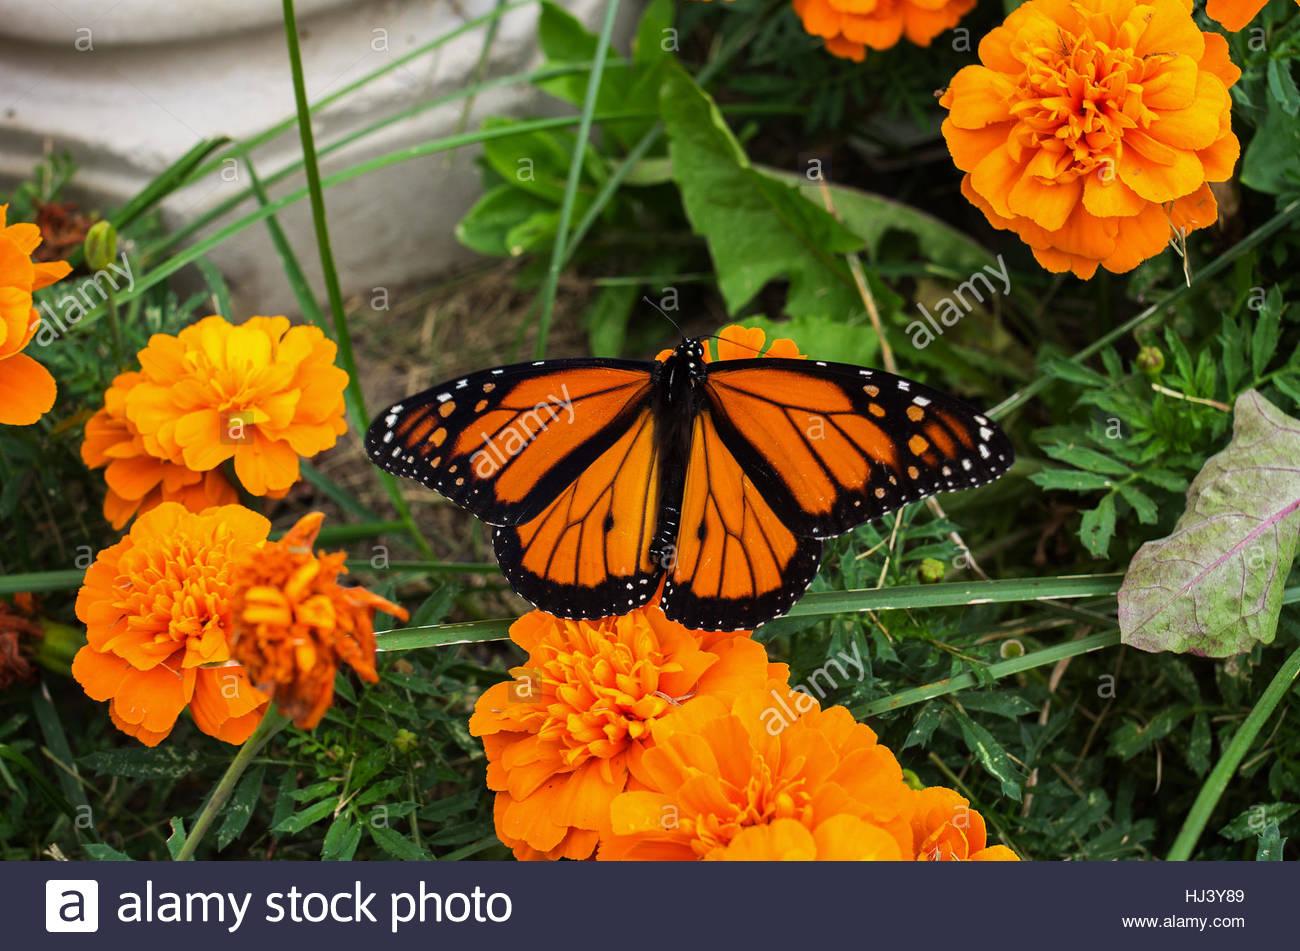 578b70c2b Monarch Butterfly on an orange marigold flower Stock Photo ...